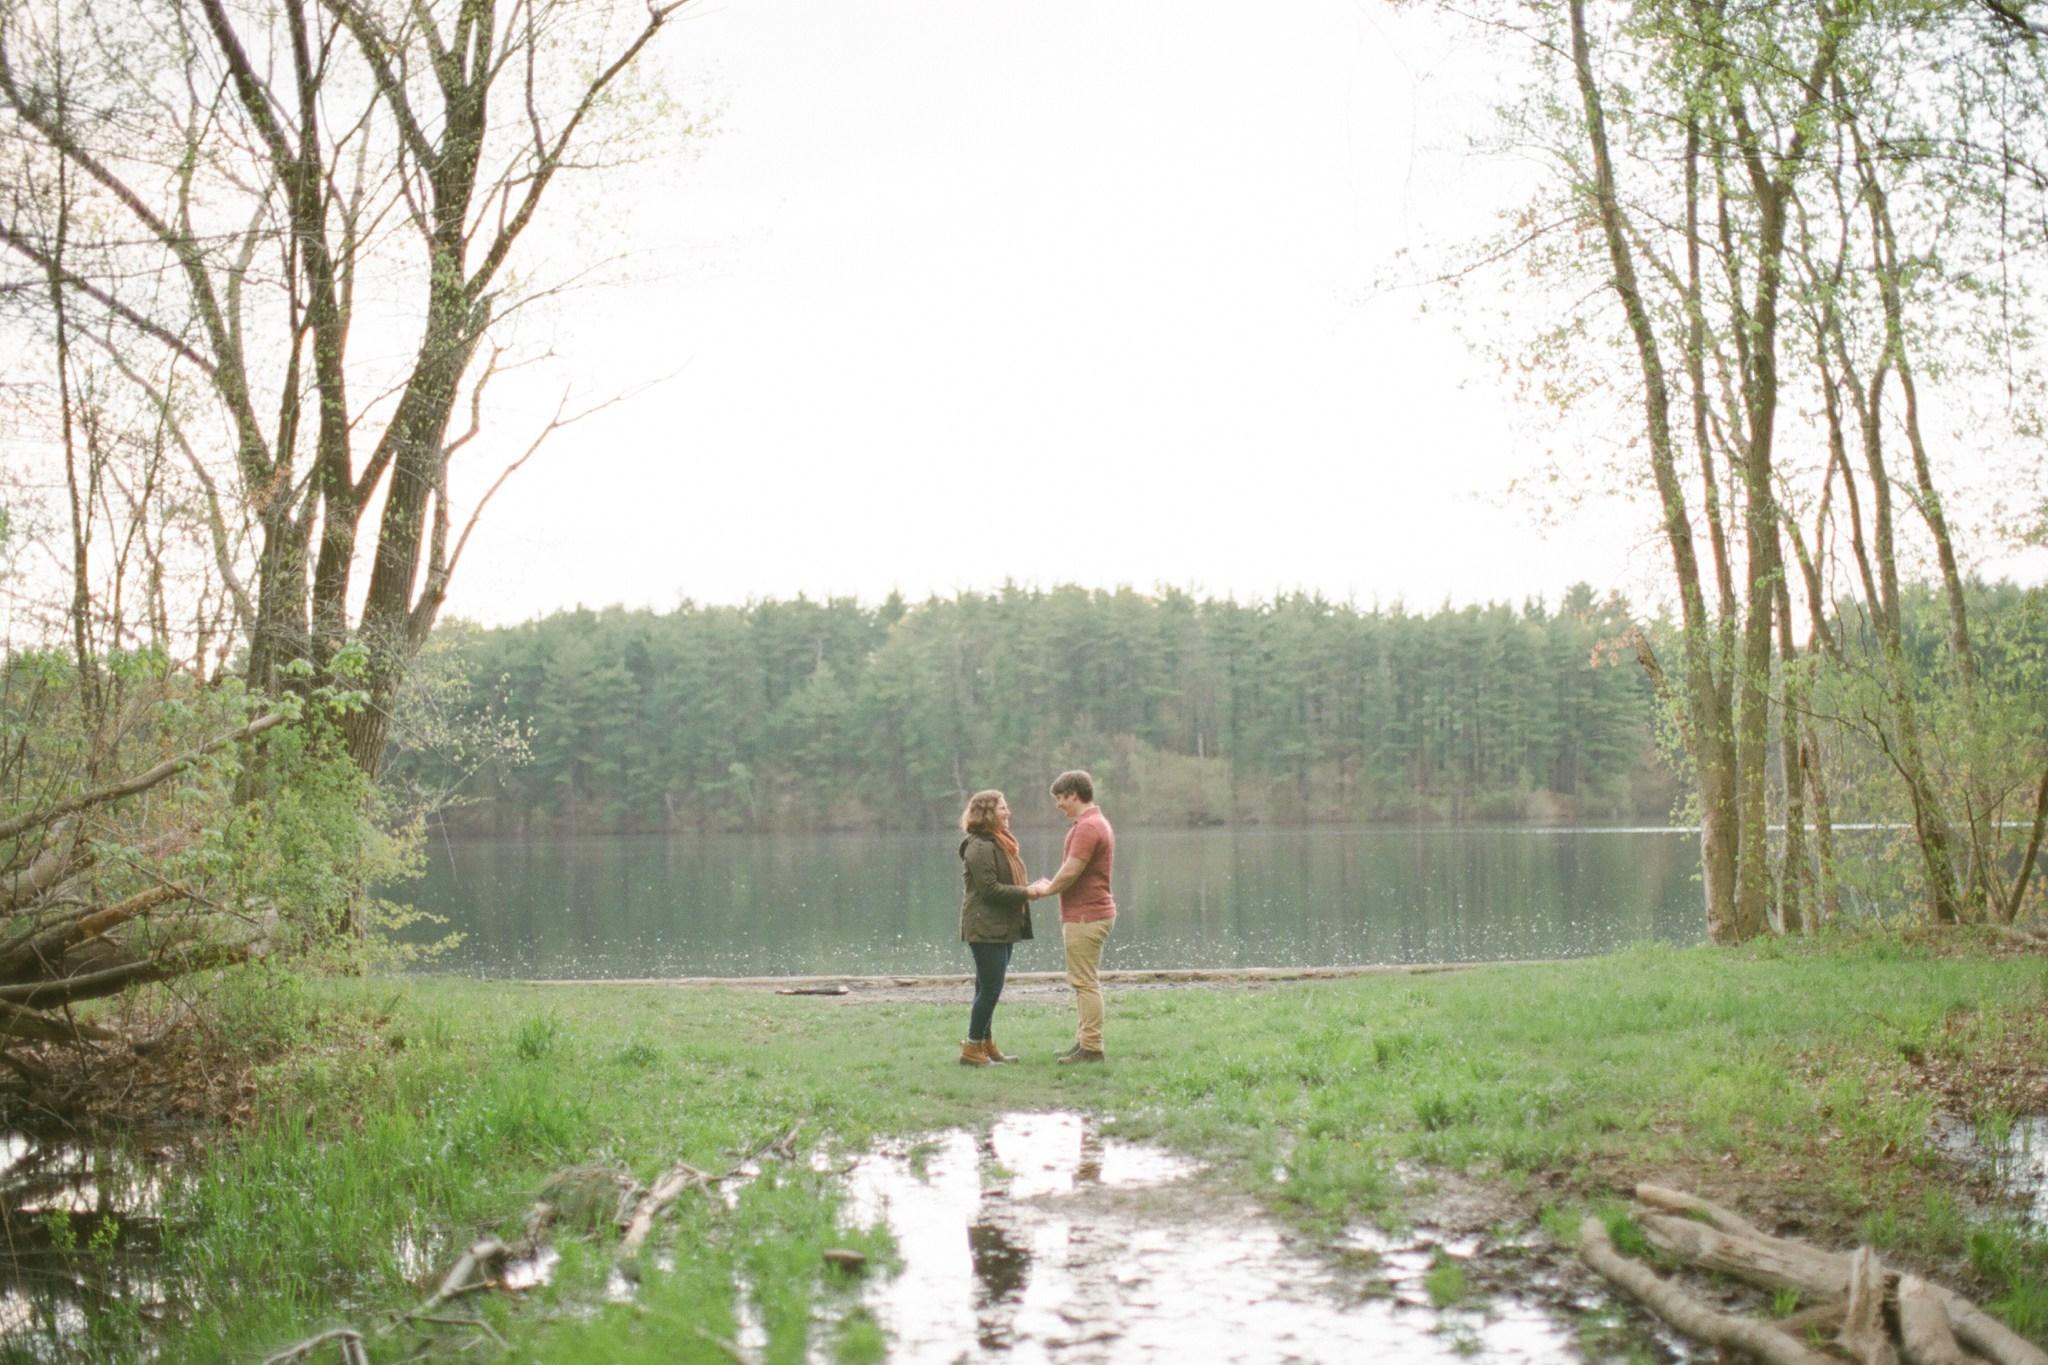 woods_north_shore_ma_engagement_photos_deborah_zoe_00007.JPG